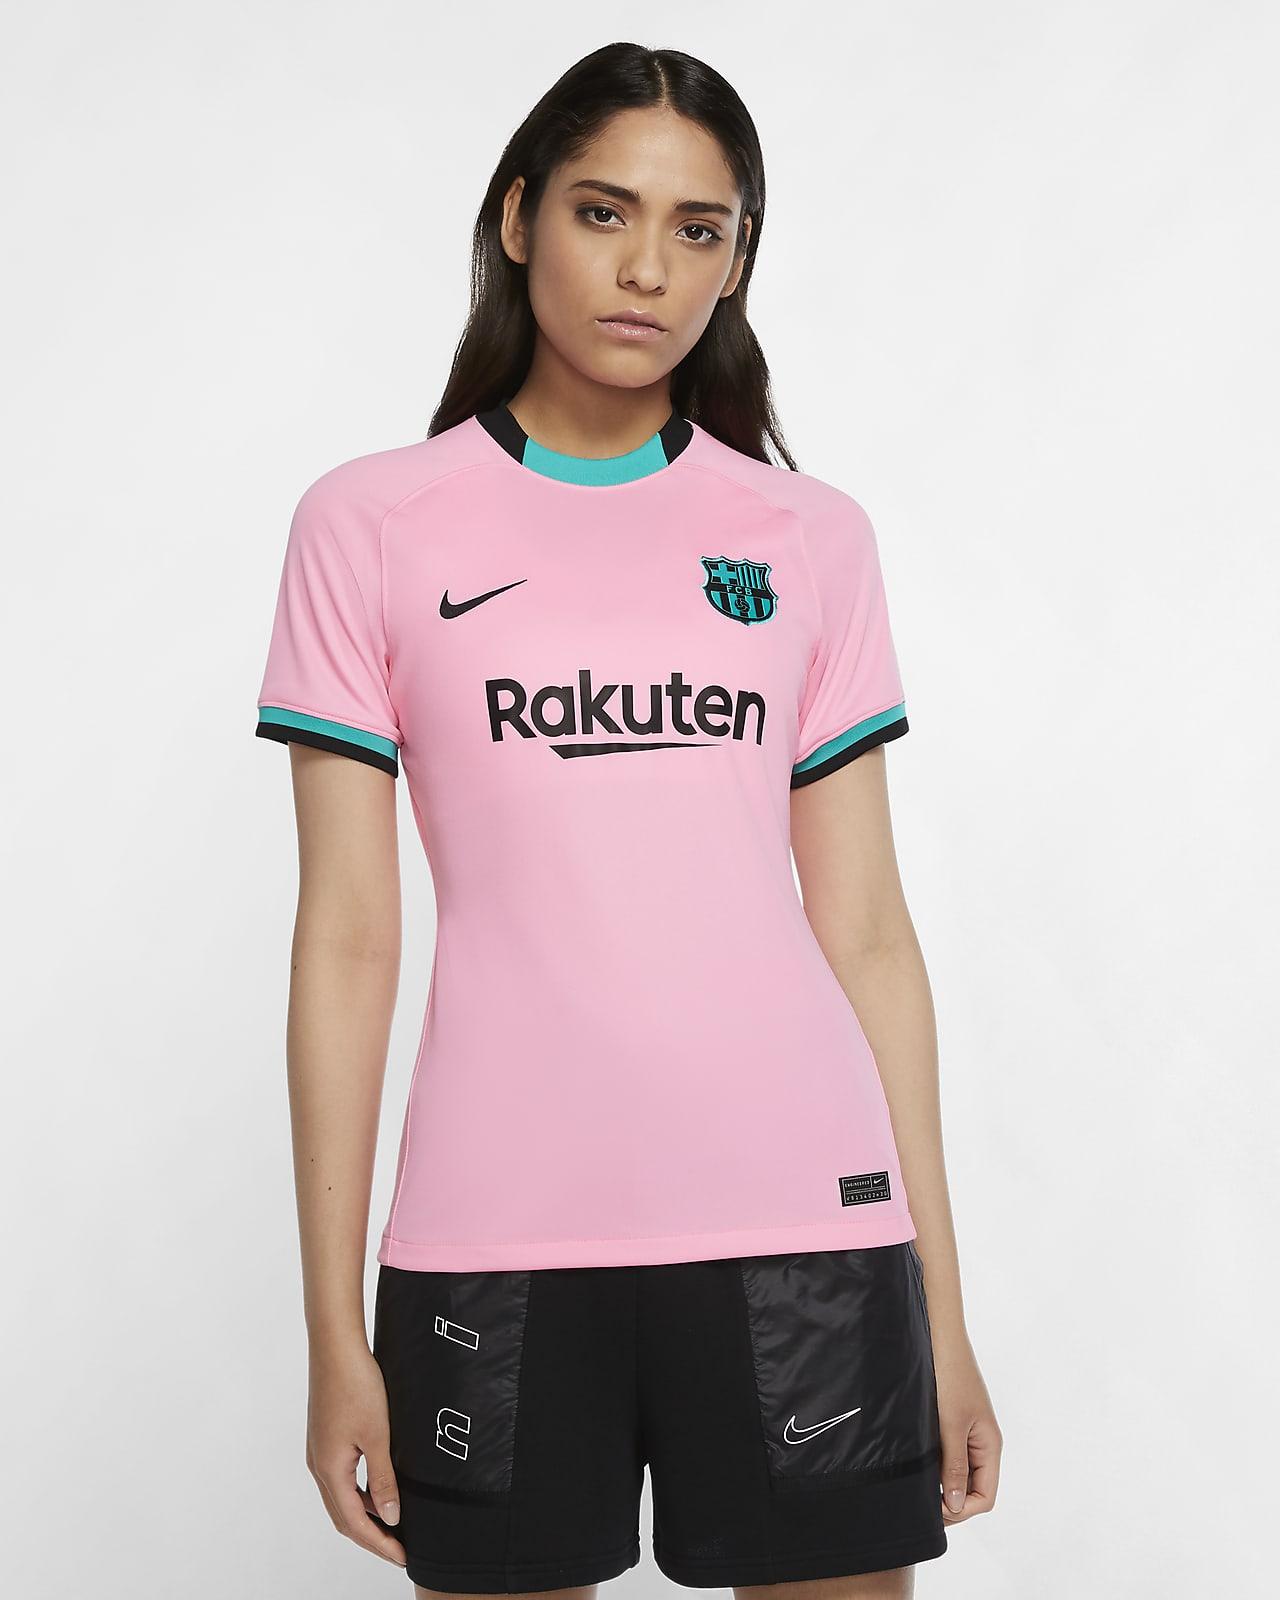 fc barcelona 2020 21 stadium third women s soccer jersey nike com fc barcelona 2020 21 stadium third women s soccer jersey